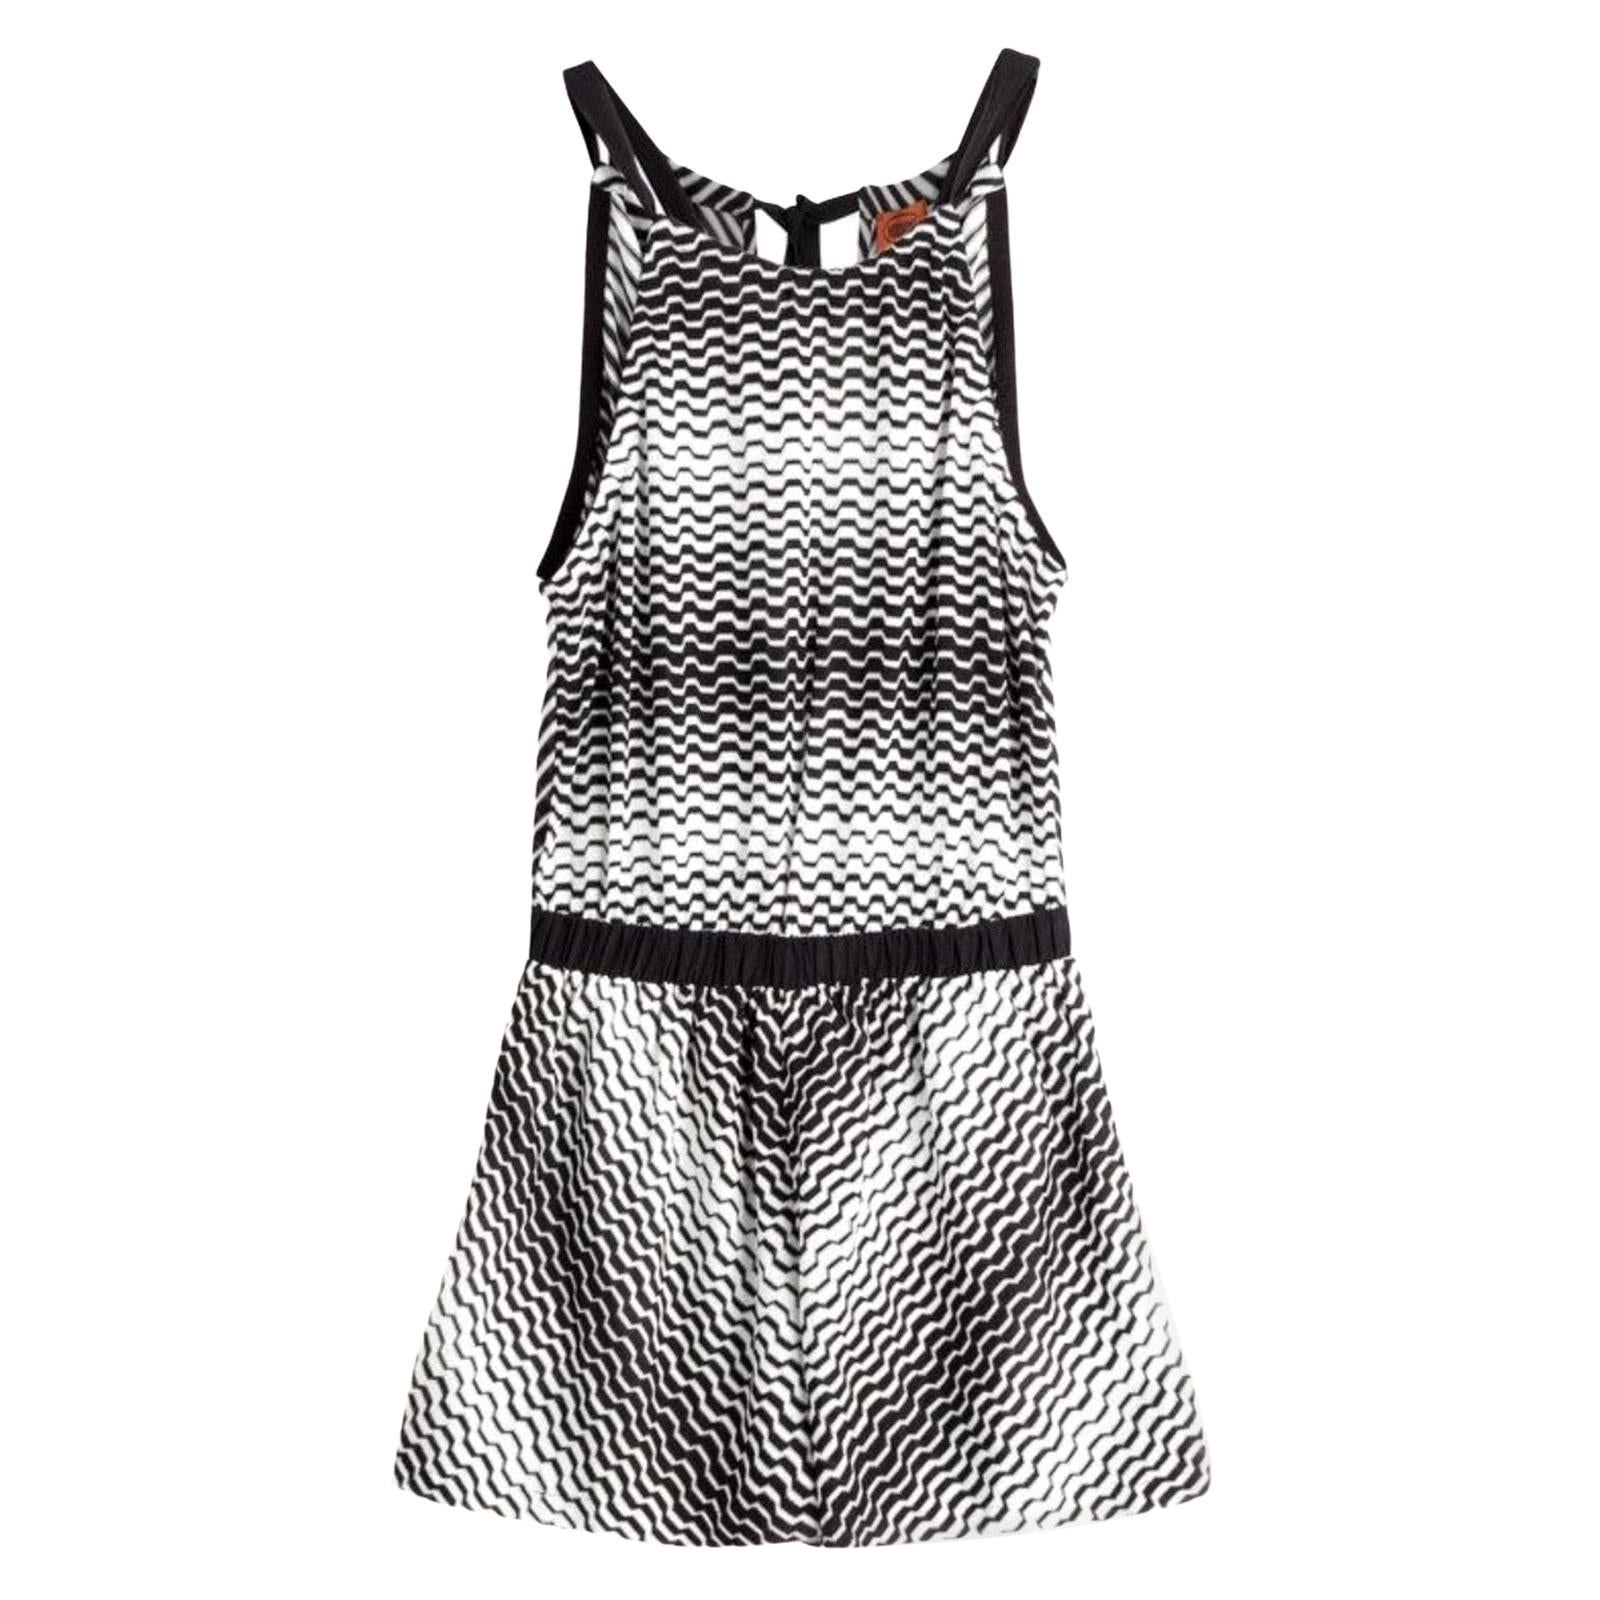 Missoni Monochrome Signature Crochet Knit Playsuit Romper Mini Jumpsuit Overall